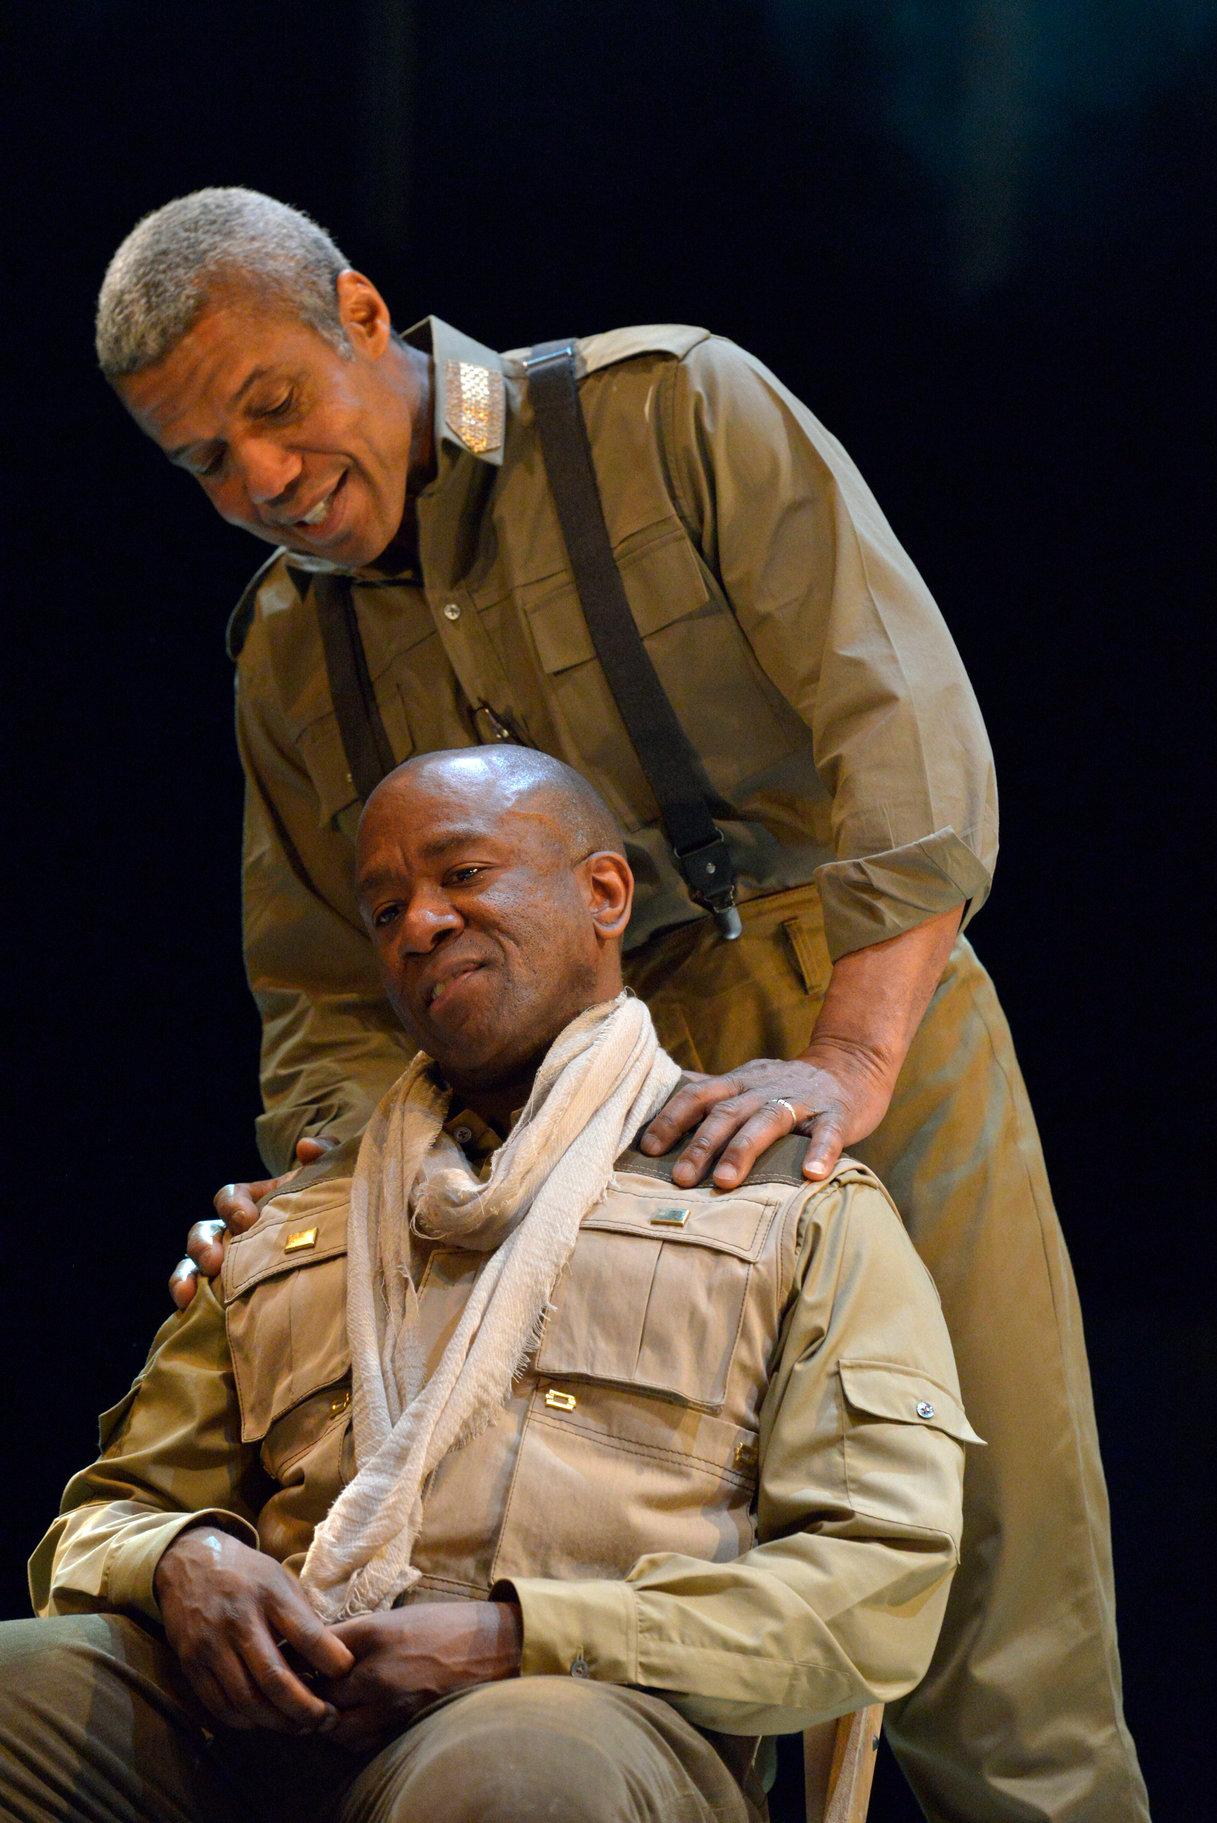 Othello stands behind Iago.